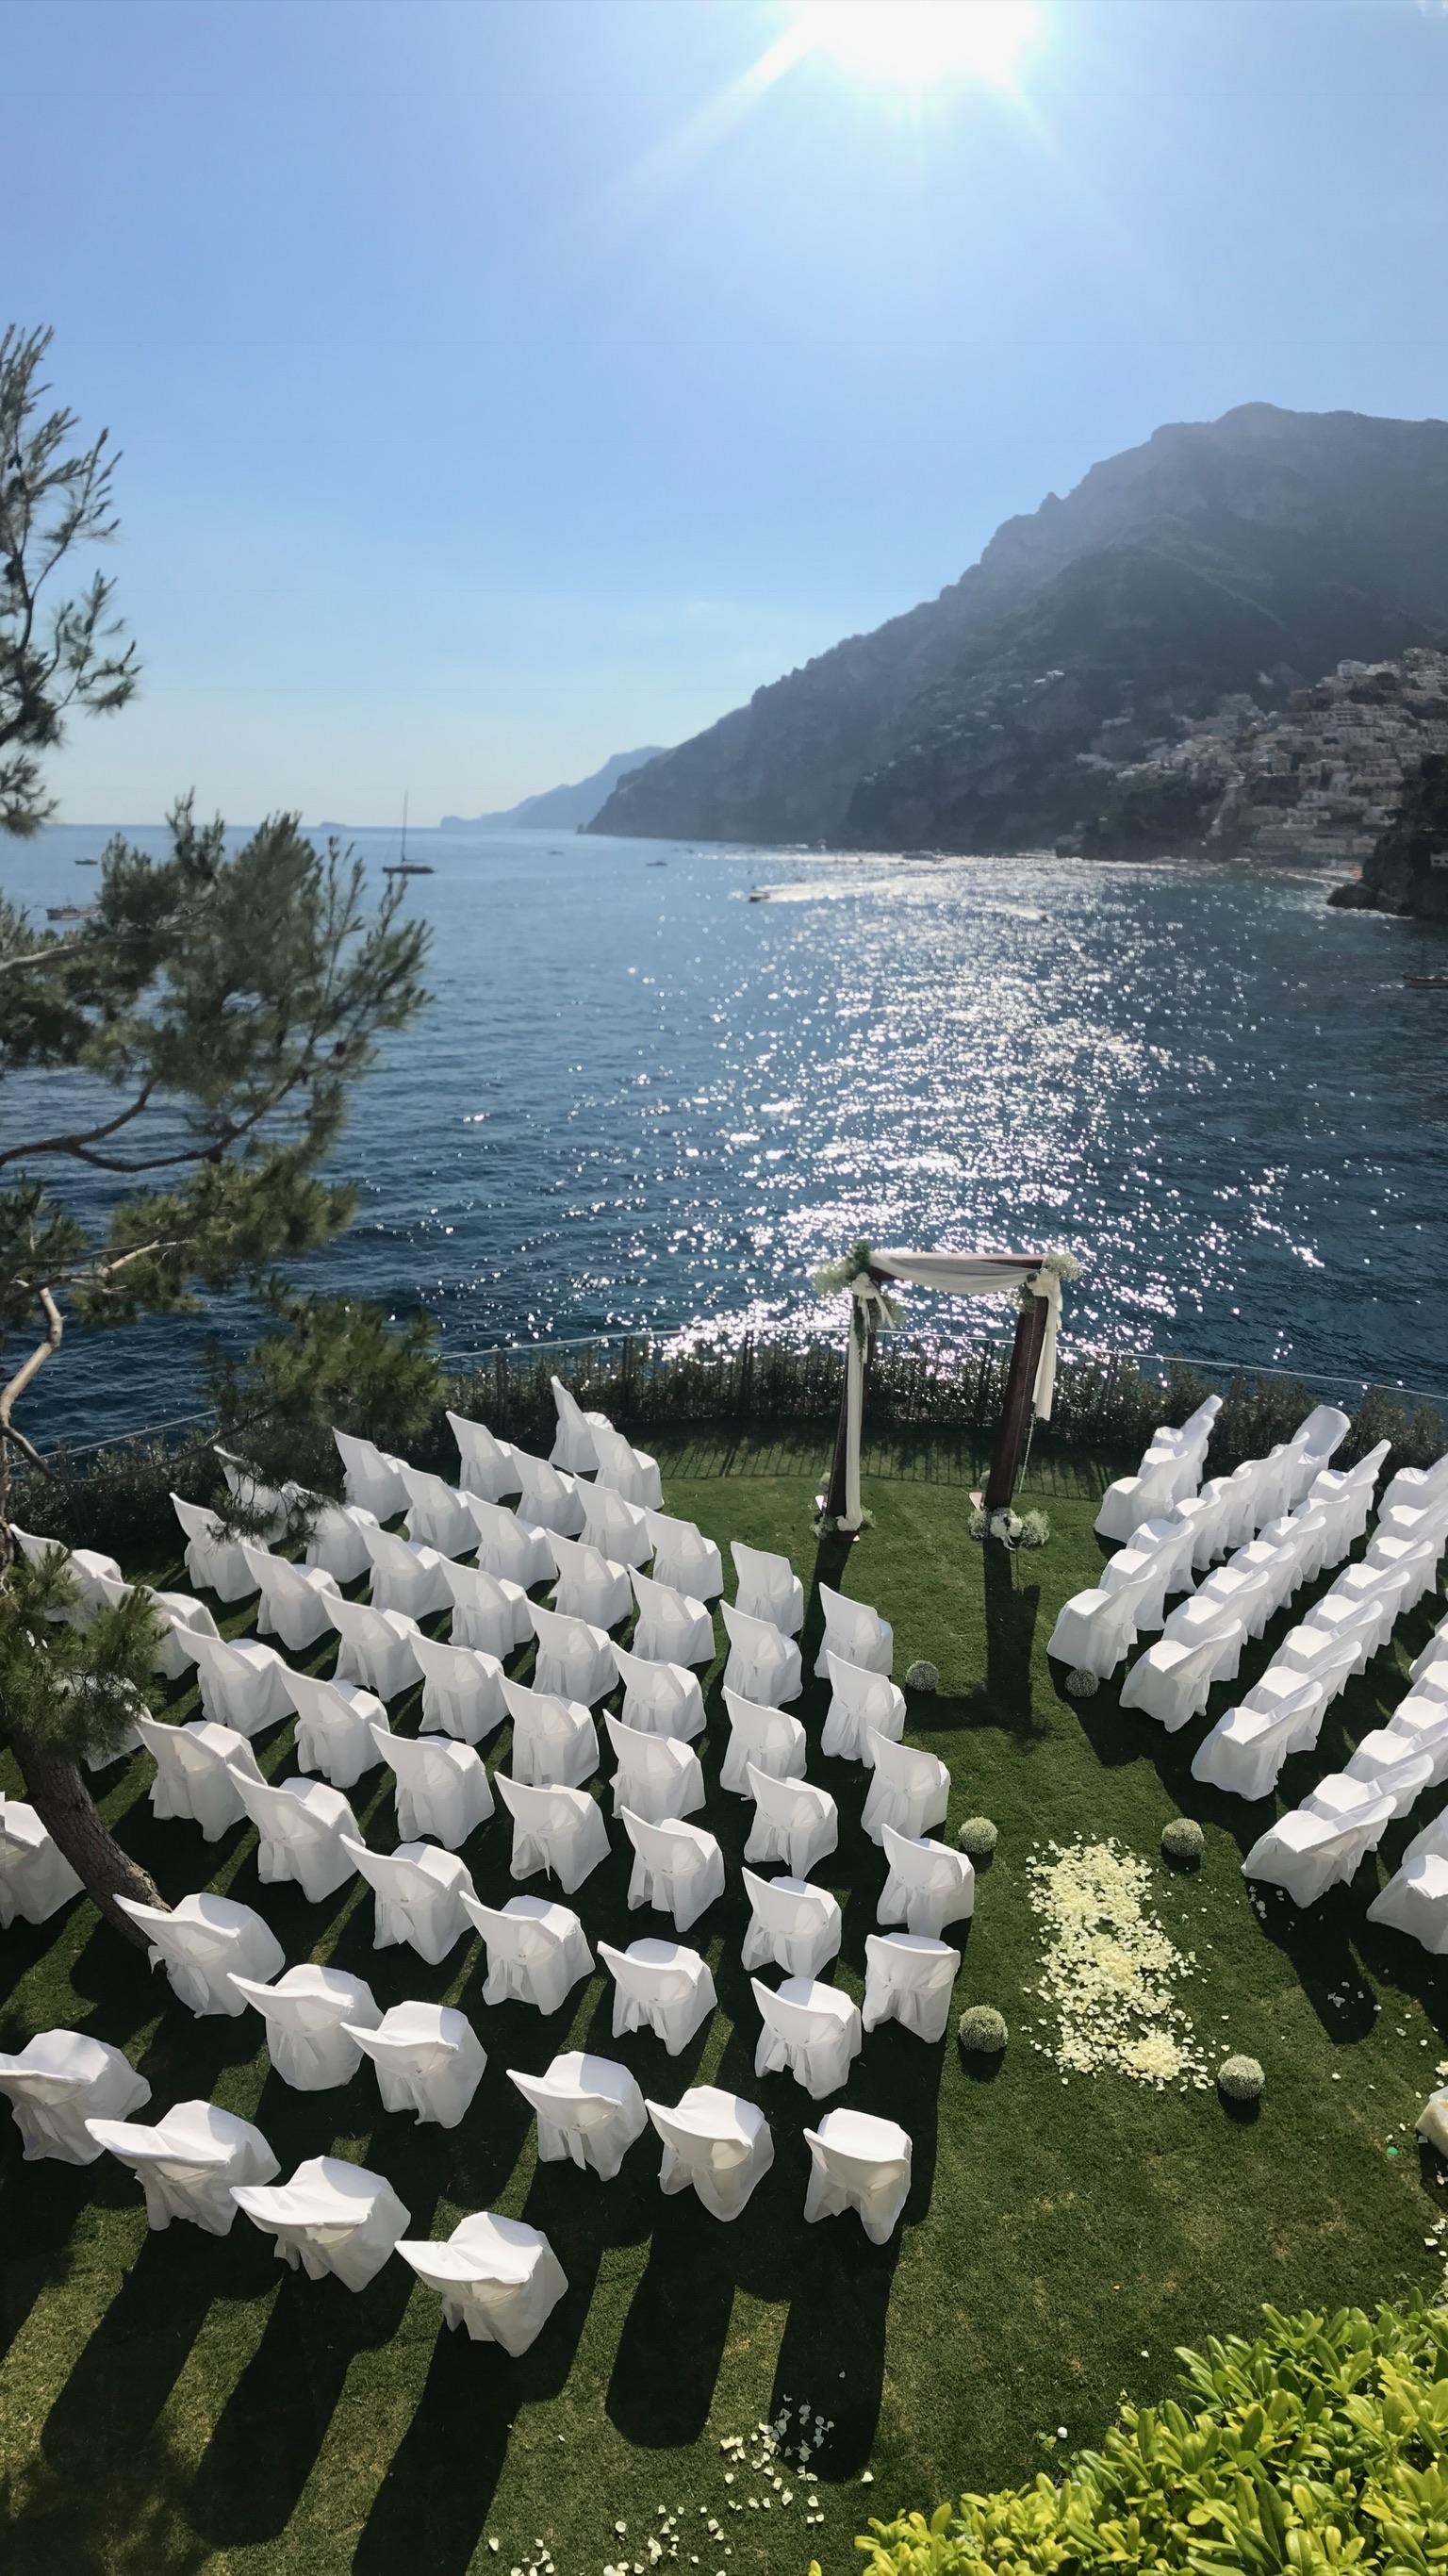 http://www.weddingamalfi.com/wp-content/uploads/Nathalie-and-Benjamin-wedding-in-Positano-20.jpg